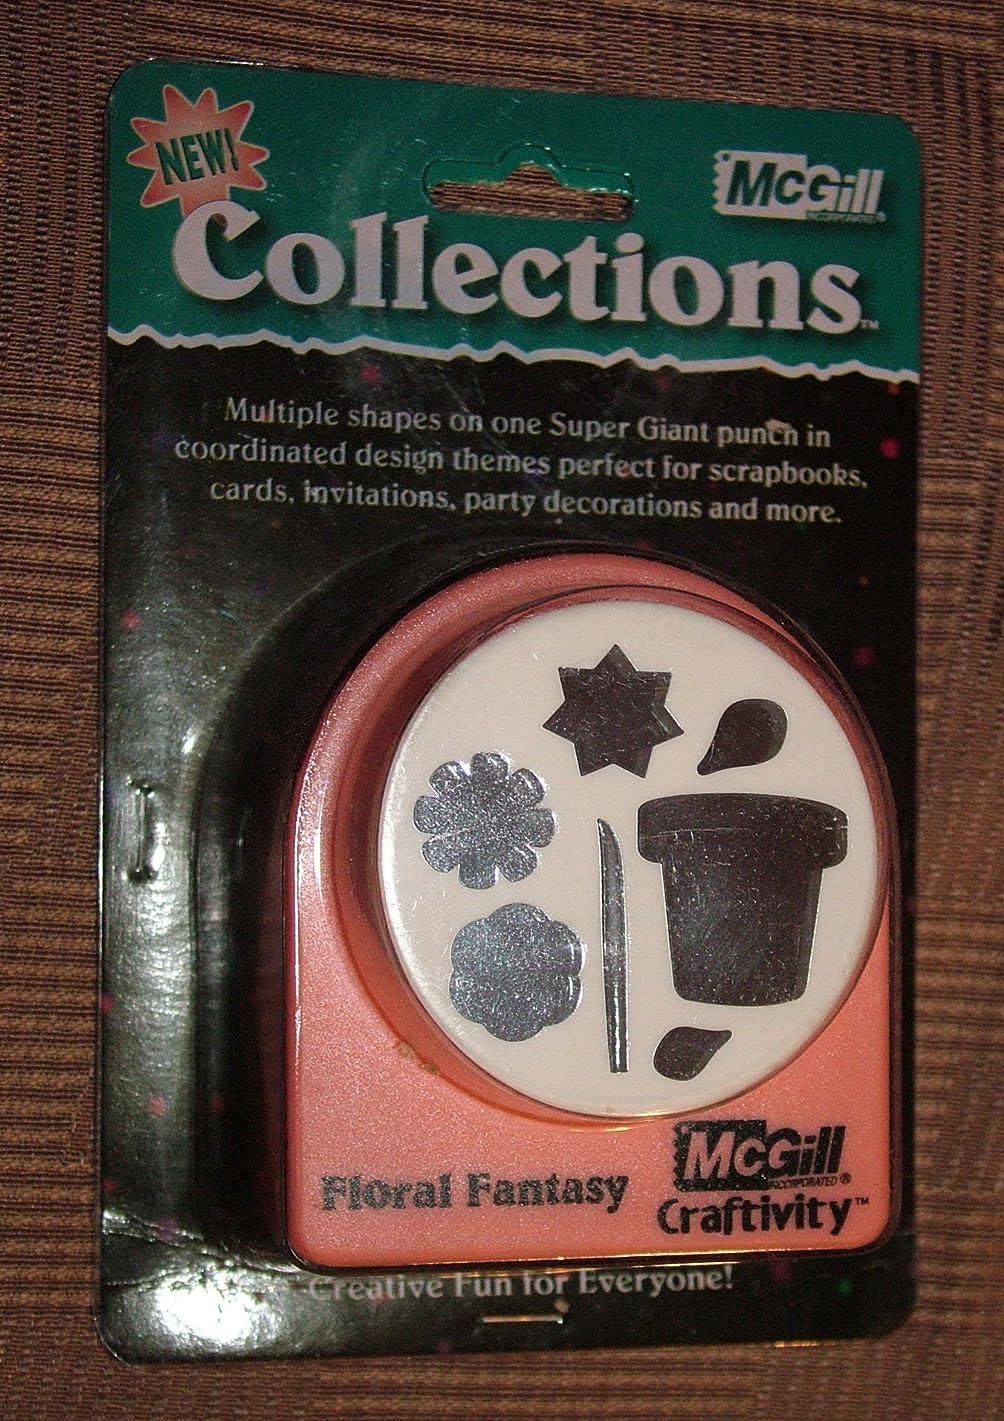 MCGILL CRAFTIVITY - Floral Fantasy - Large 3 1/2